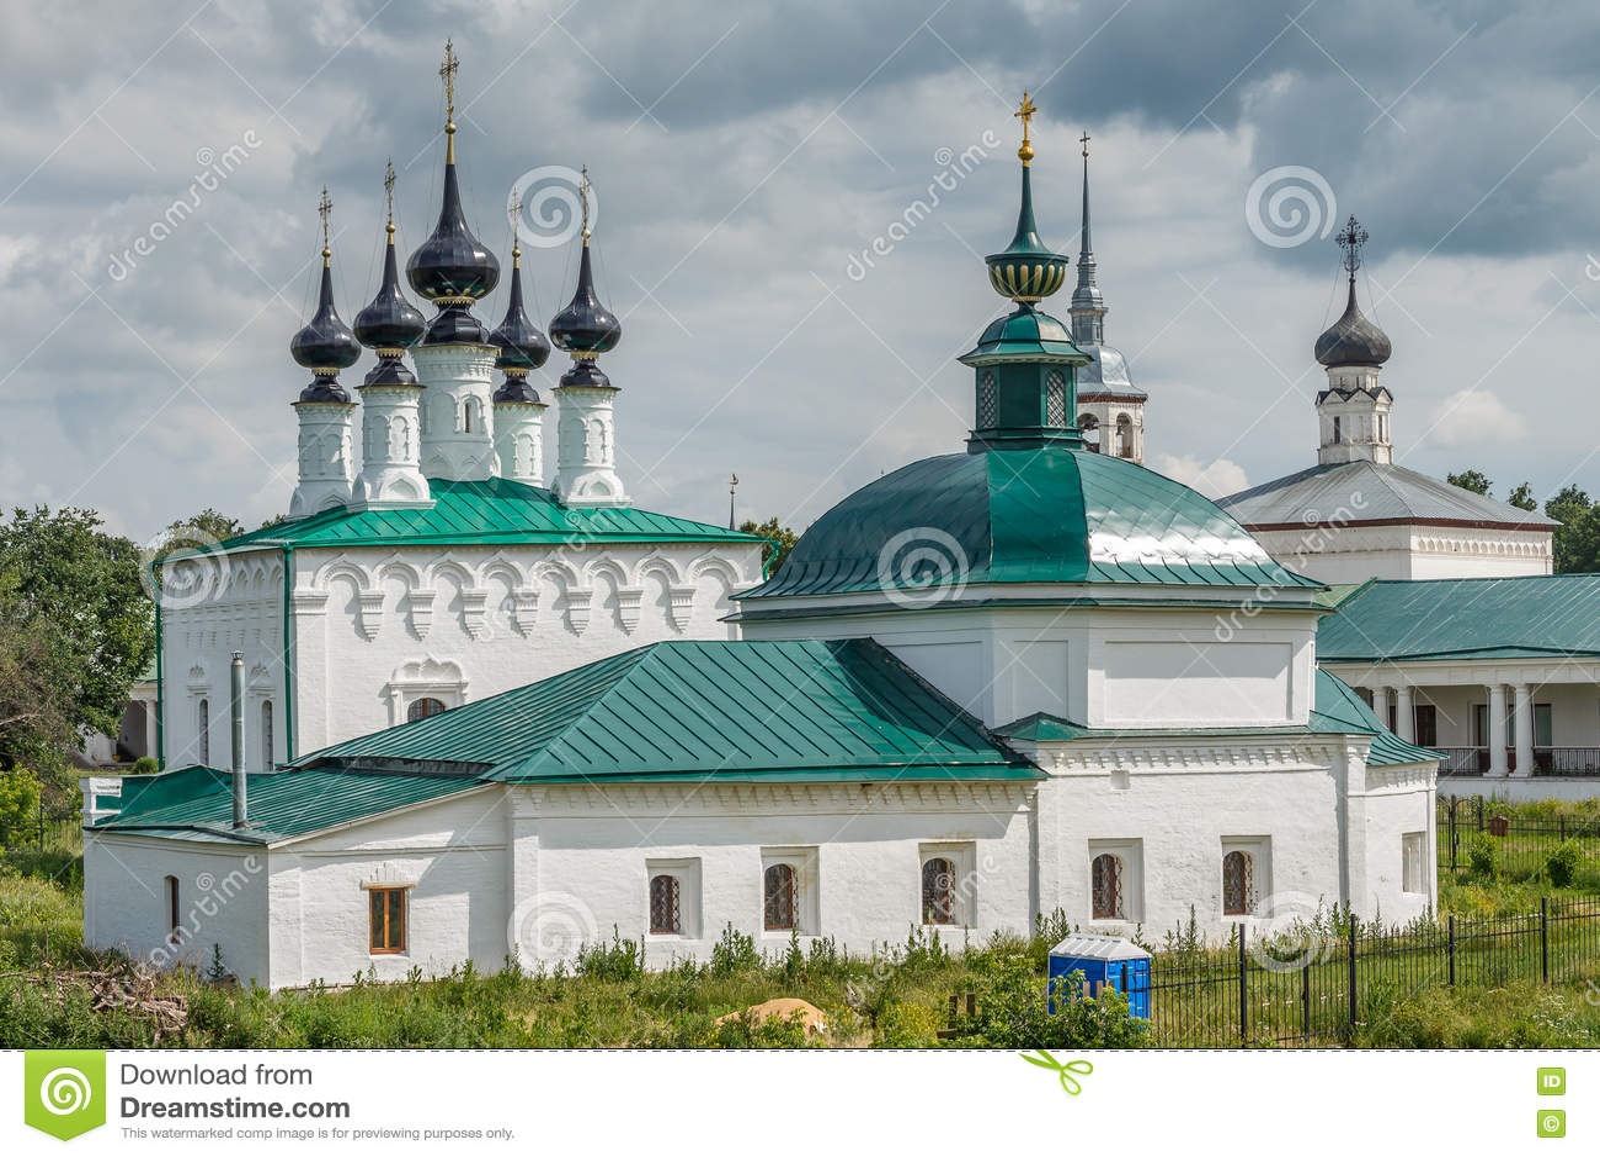 Architekturmonumente von Suzdal